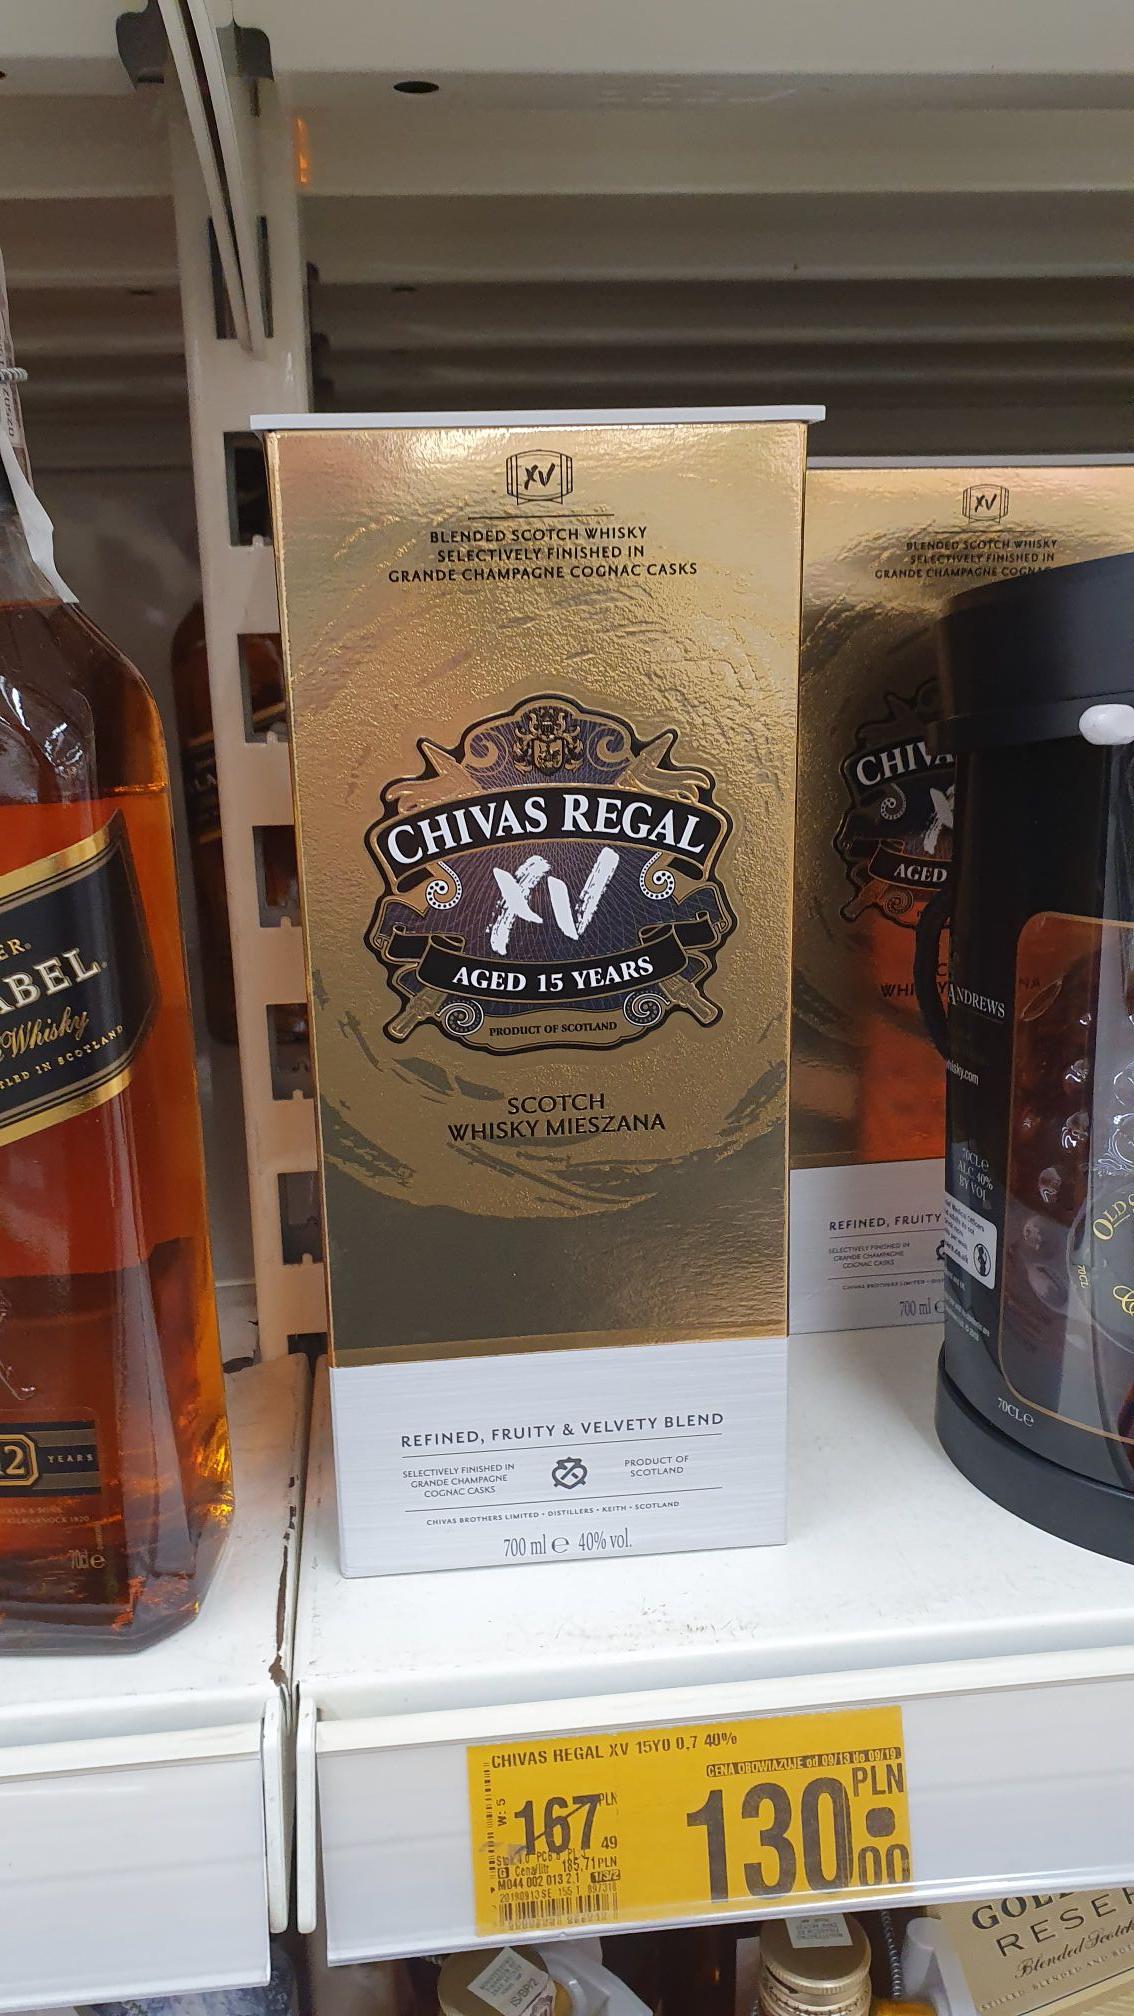 Chivas Regal XV - Auchan